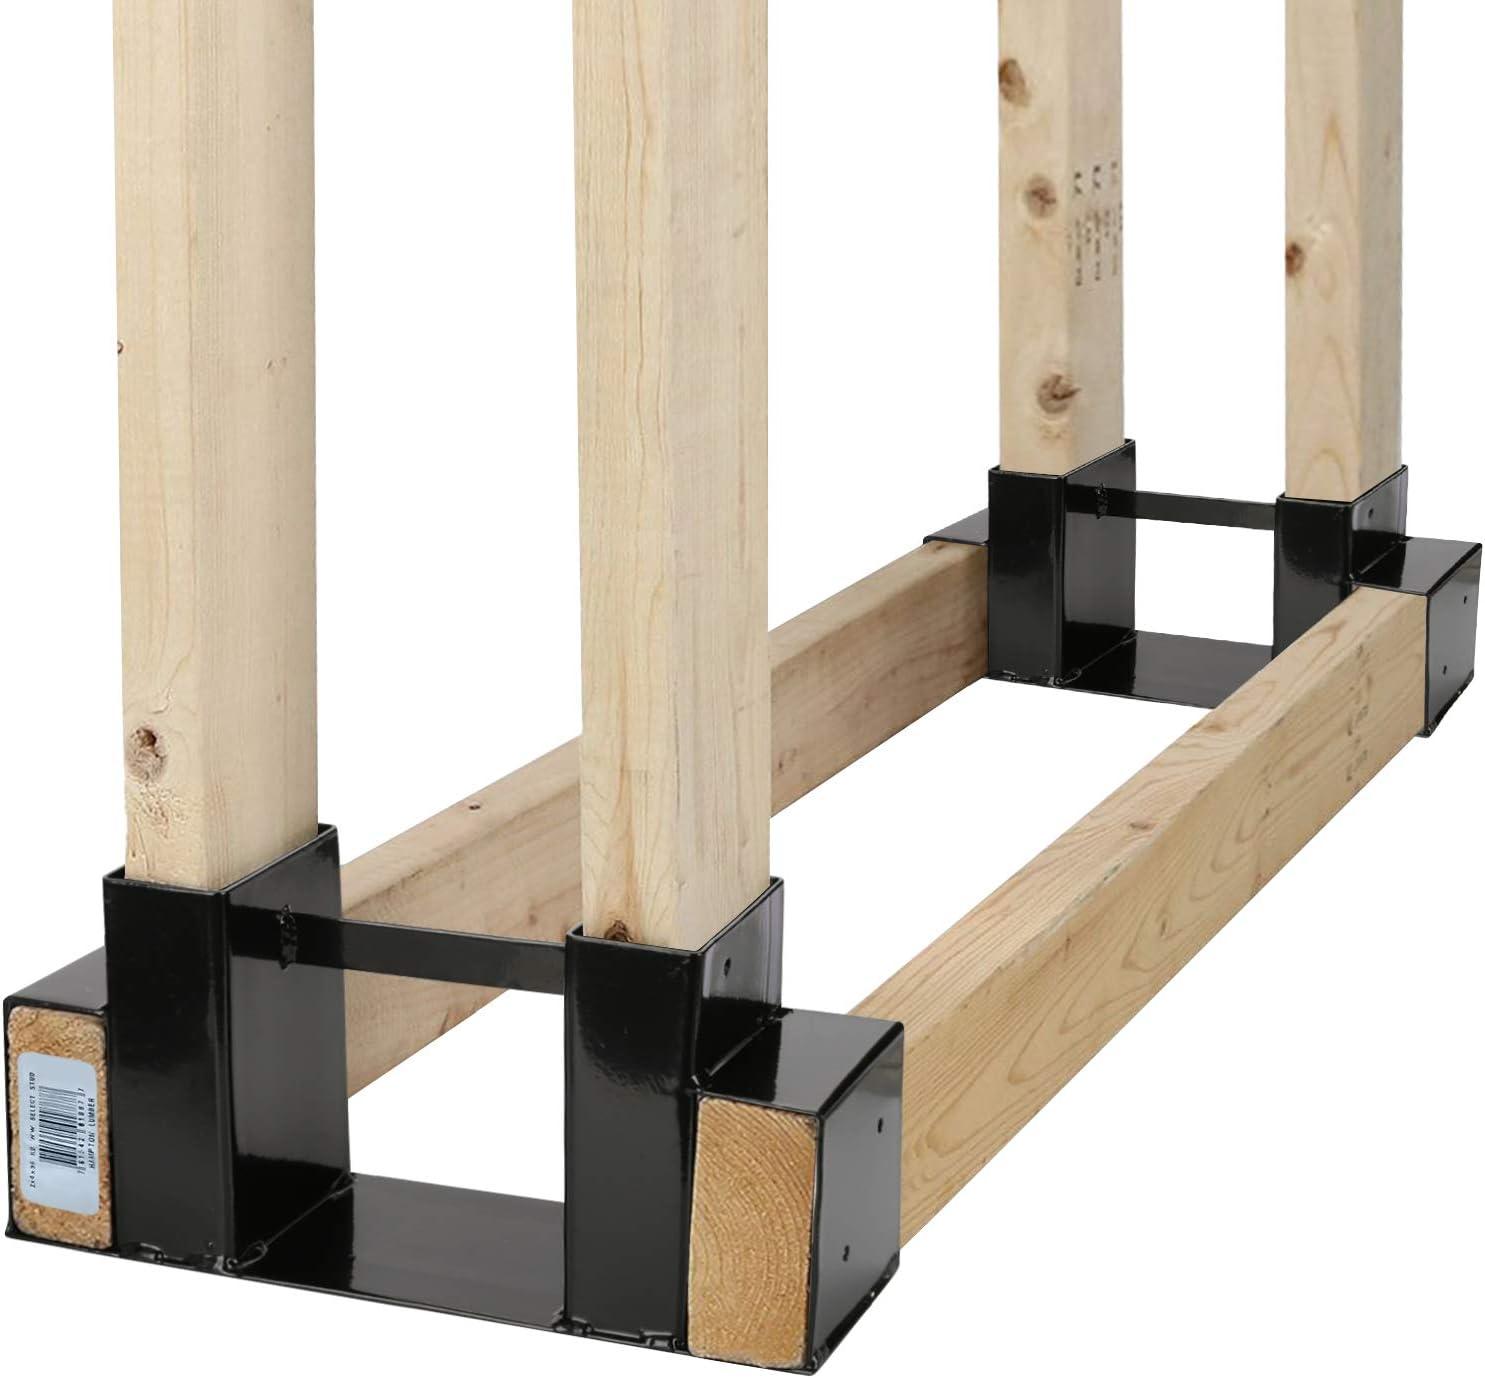 Outdoor Firewood Log Rack Bracket Kit Fireplace Wood Storage Holder Adjustable To Any Length 2 Bracket Kit Home Improvement